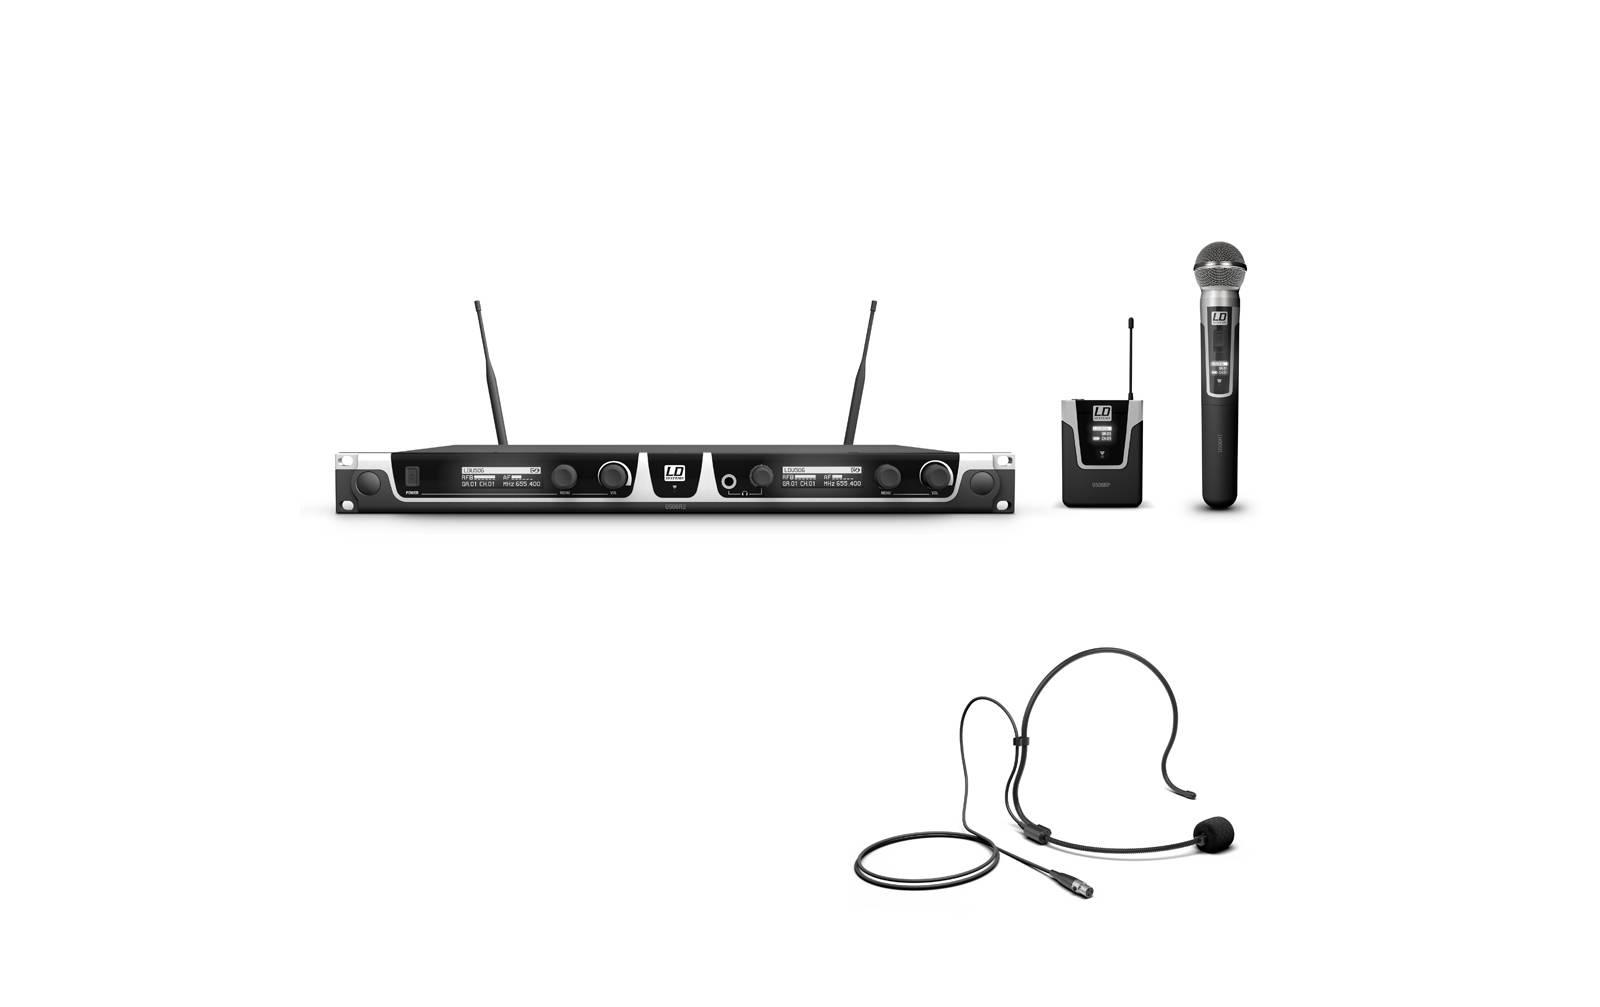 ld-systems-u506-hbh-2-funkmikrofon-system-mit-bodypack-headset-und-handmikrofon-dynamisch